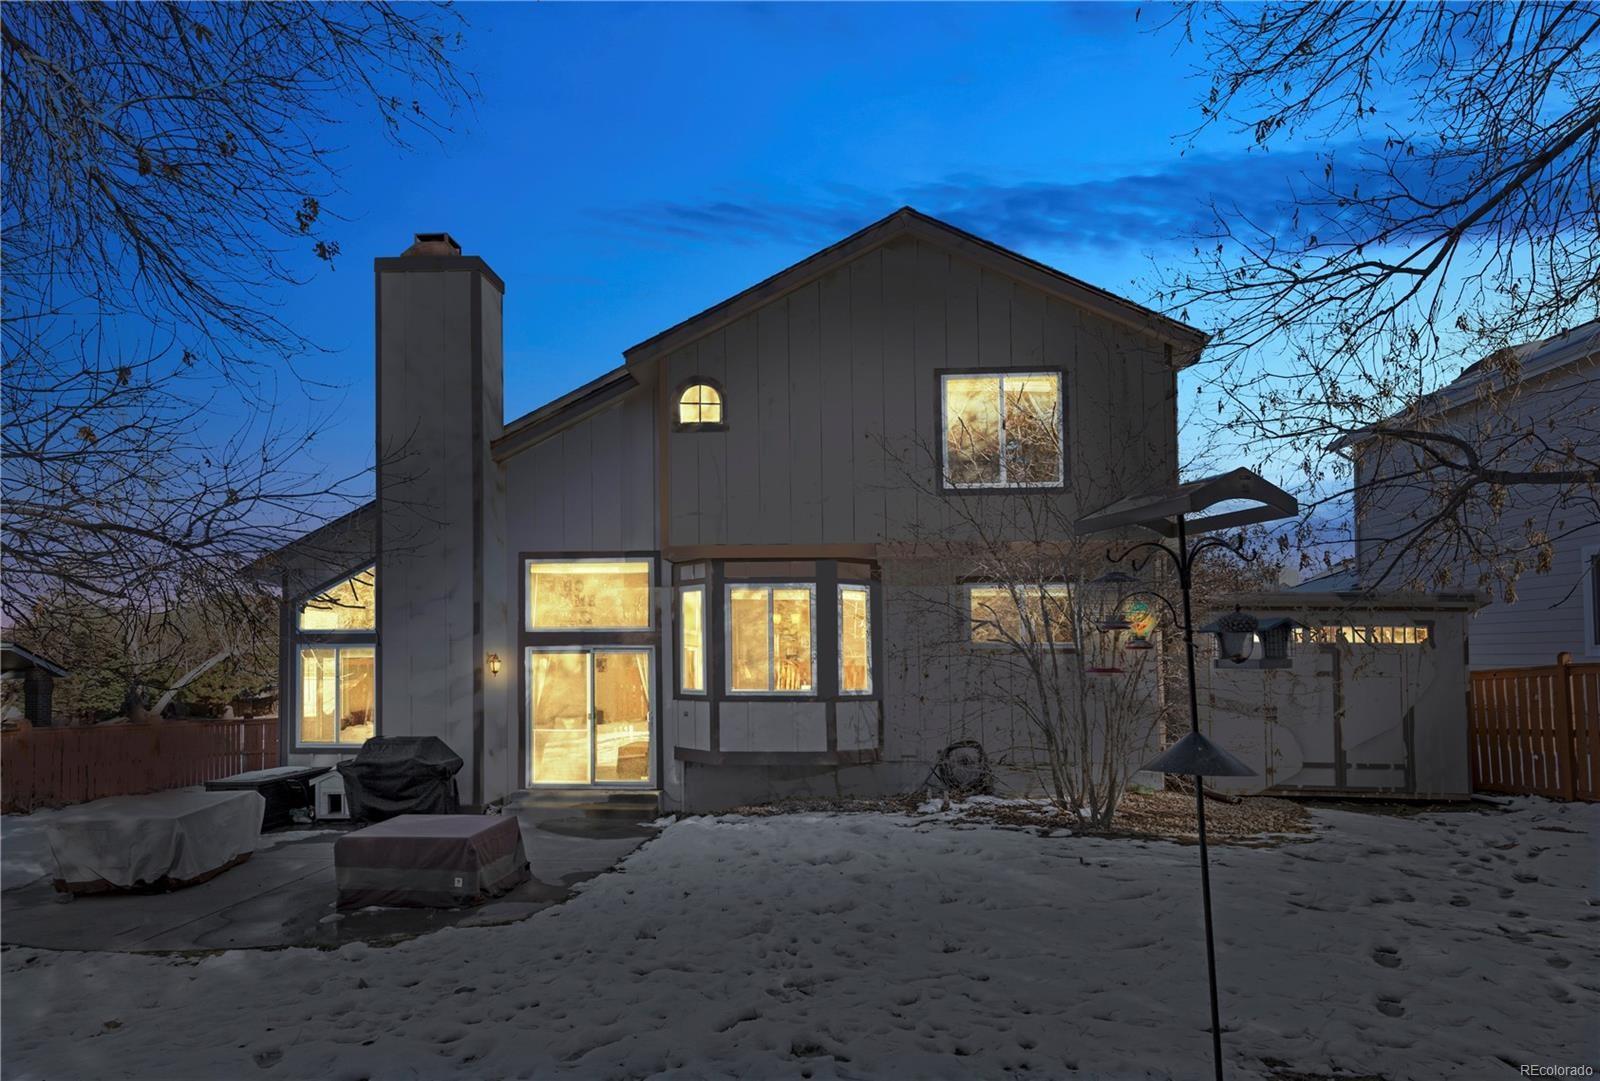 MLS# 5243579 - 34 - 9325 Windsor Way, Highlands Ranch, CO 80126